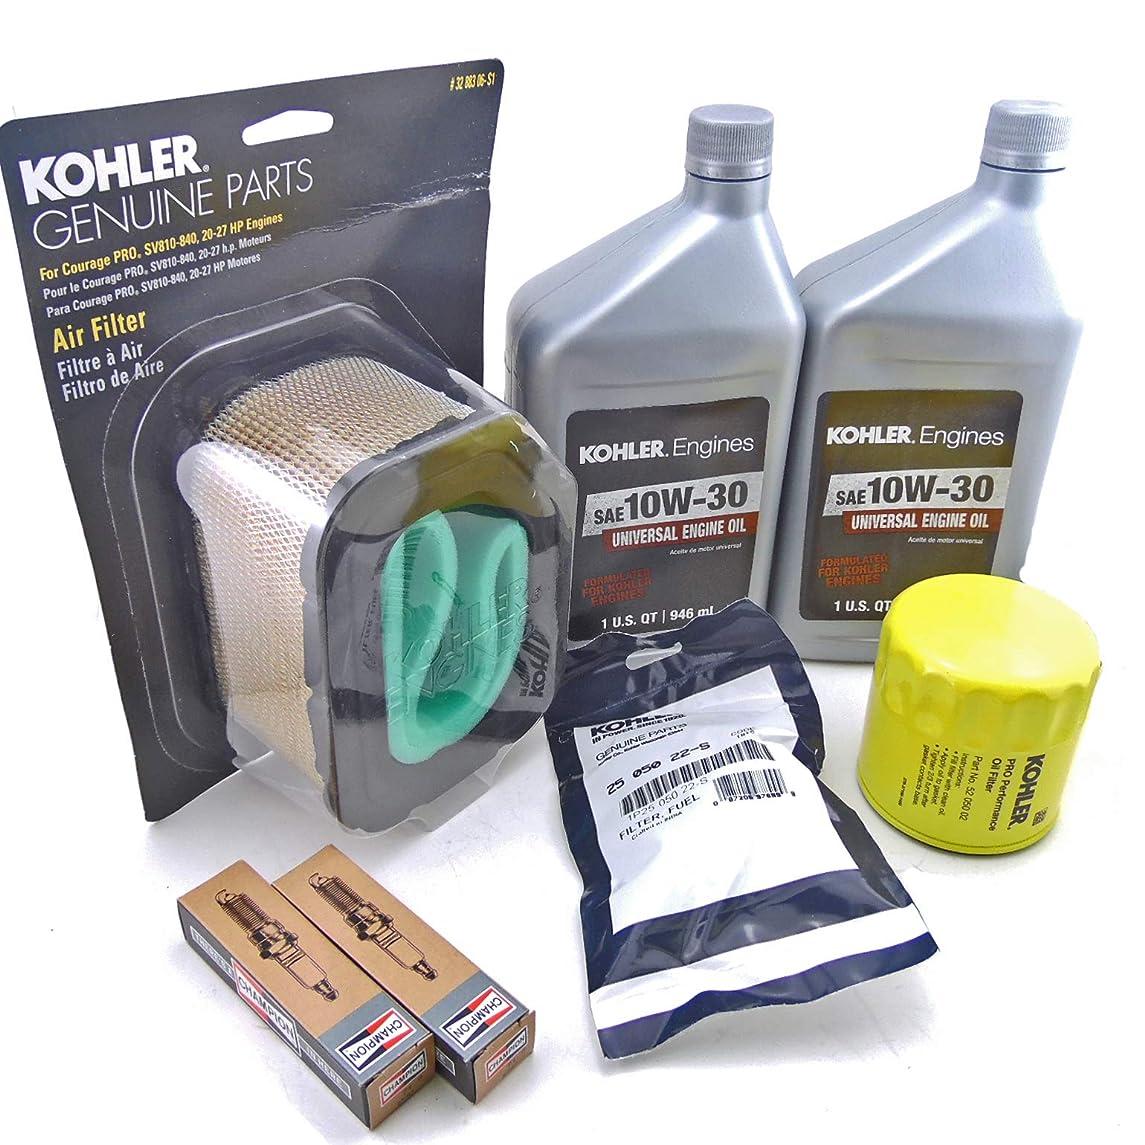 Other Kohler Maintenance Kit for Courage SV830 Kohler Engines